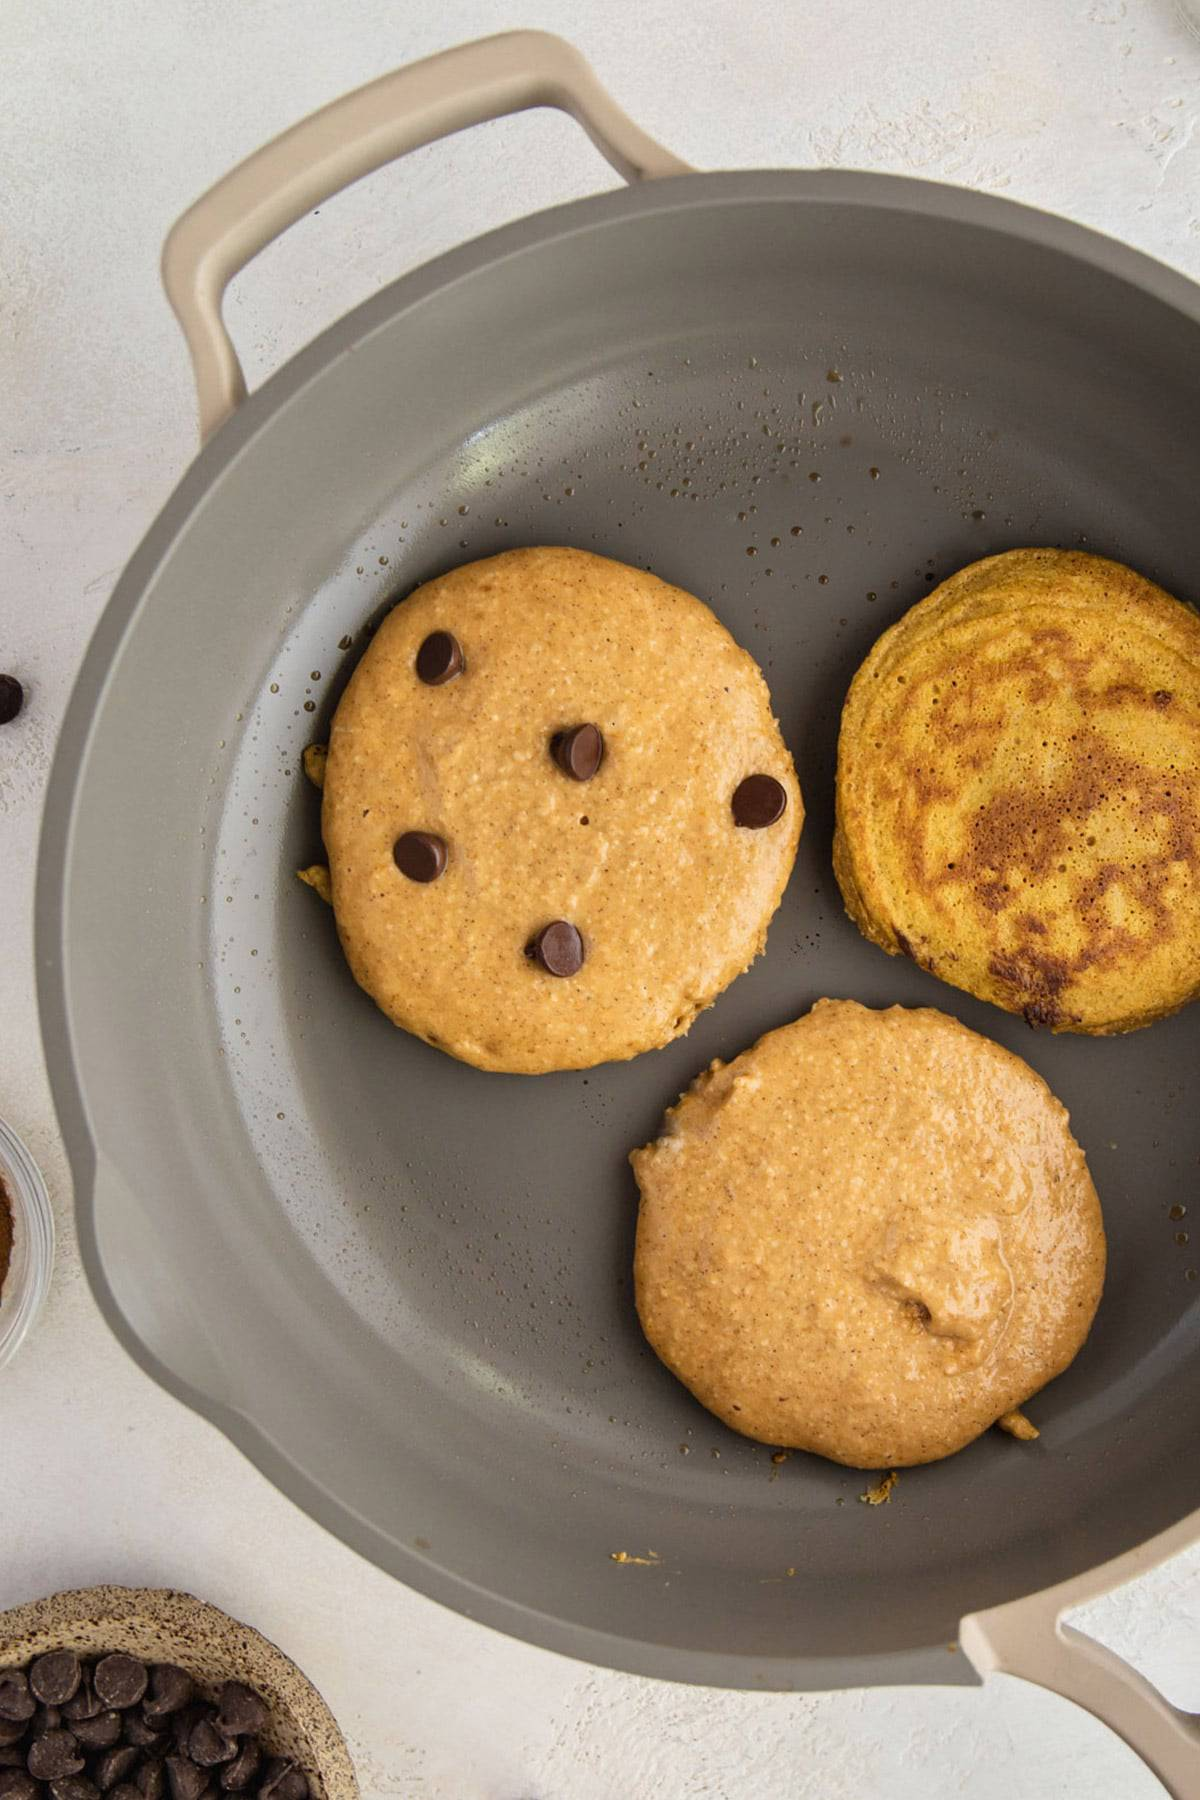 Paleo pumpkin pancakes in a skillet.